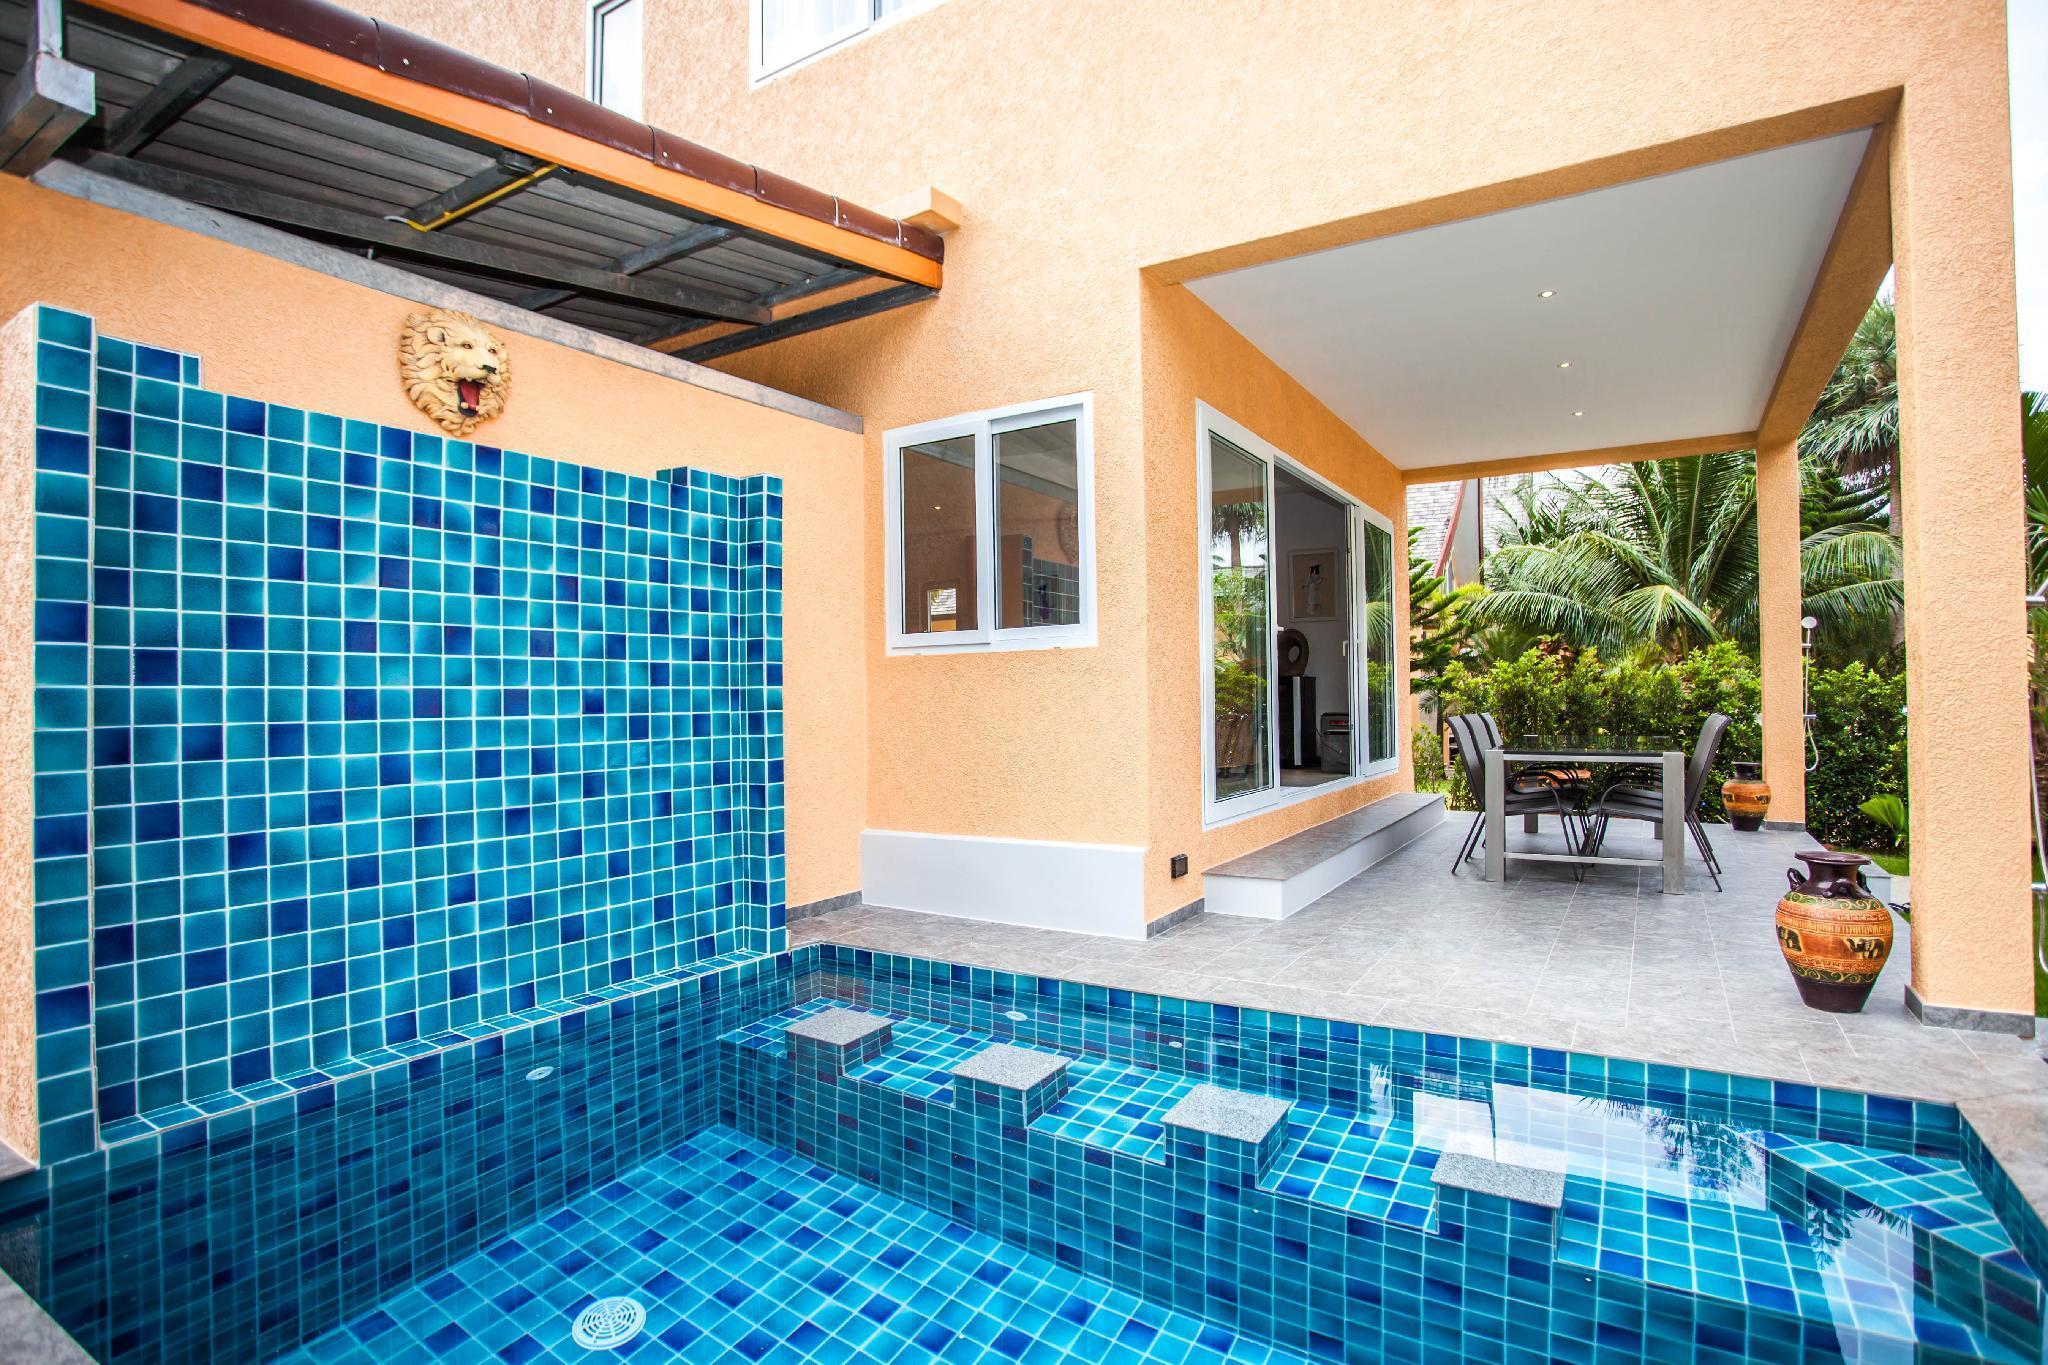 Blue Lion 5BR Villa Private Pool Koh Chang วิลลา 5 ห้องนอน 5 ห้องน้ำส่วนตัว ขนาด 200 ตร.ม. – คลองสน